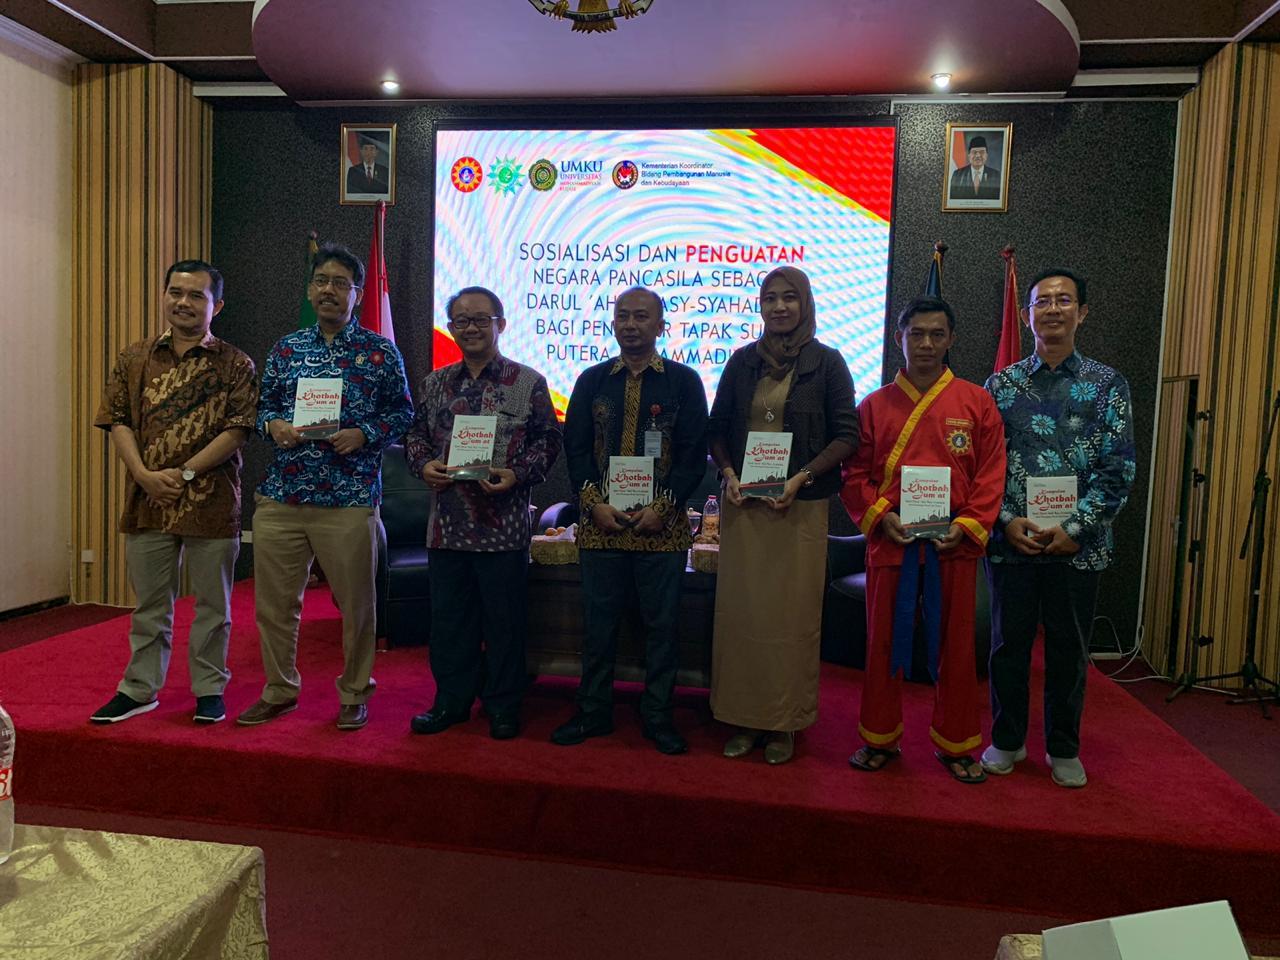 Muhammadiyah-Kemenko PMK Sinergitas Program GNRM